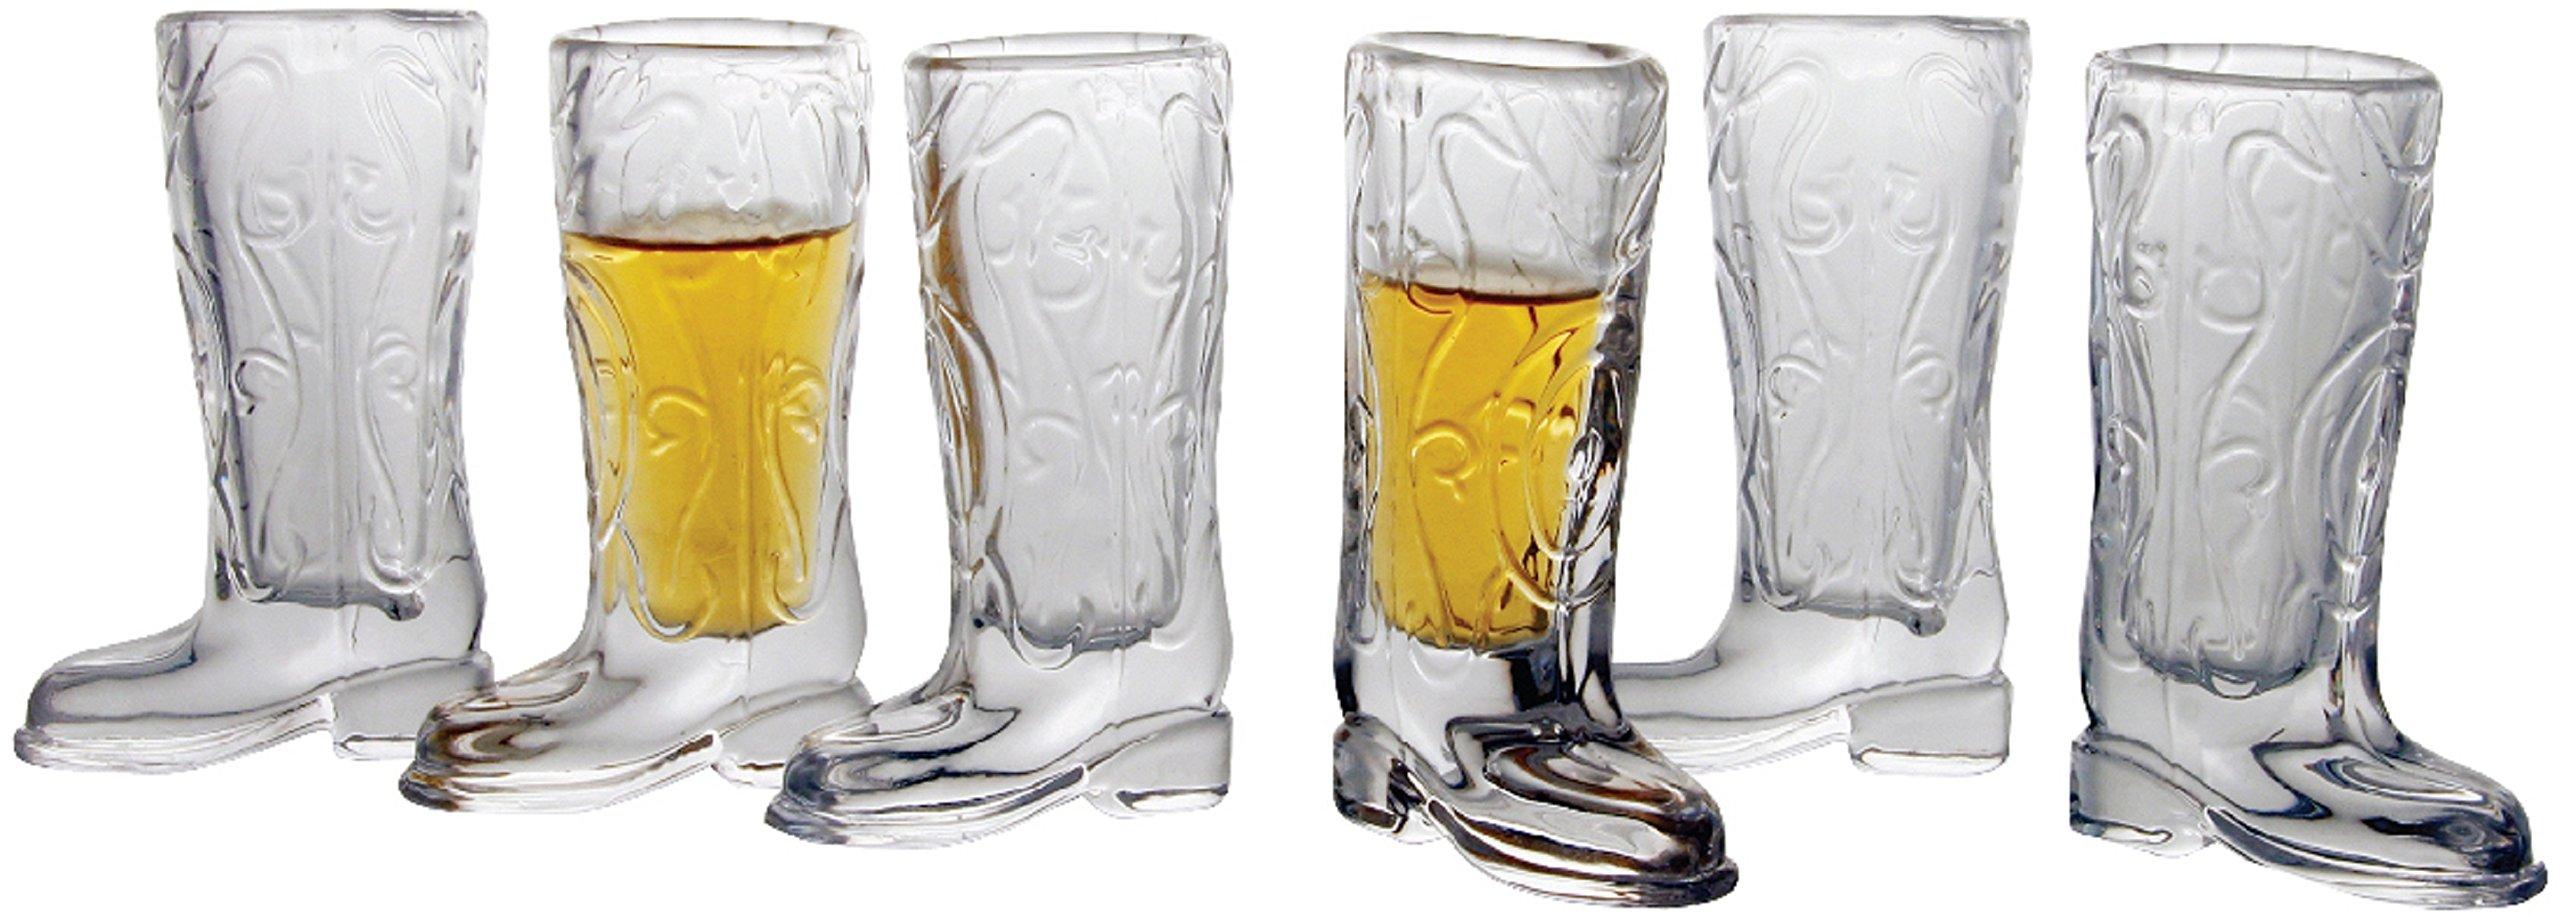 Circleware Kickback Whiskey Glass Shot Glasses Funny Cowboy Boots, Set of 6, Heavy Base Entertainment Beverage Drinking Glassware for Liquor and Bar Barrel Dining Decor, 6 Boot Shots, 1.5 oz